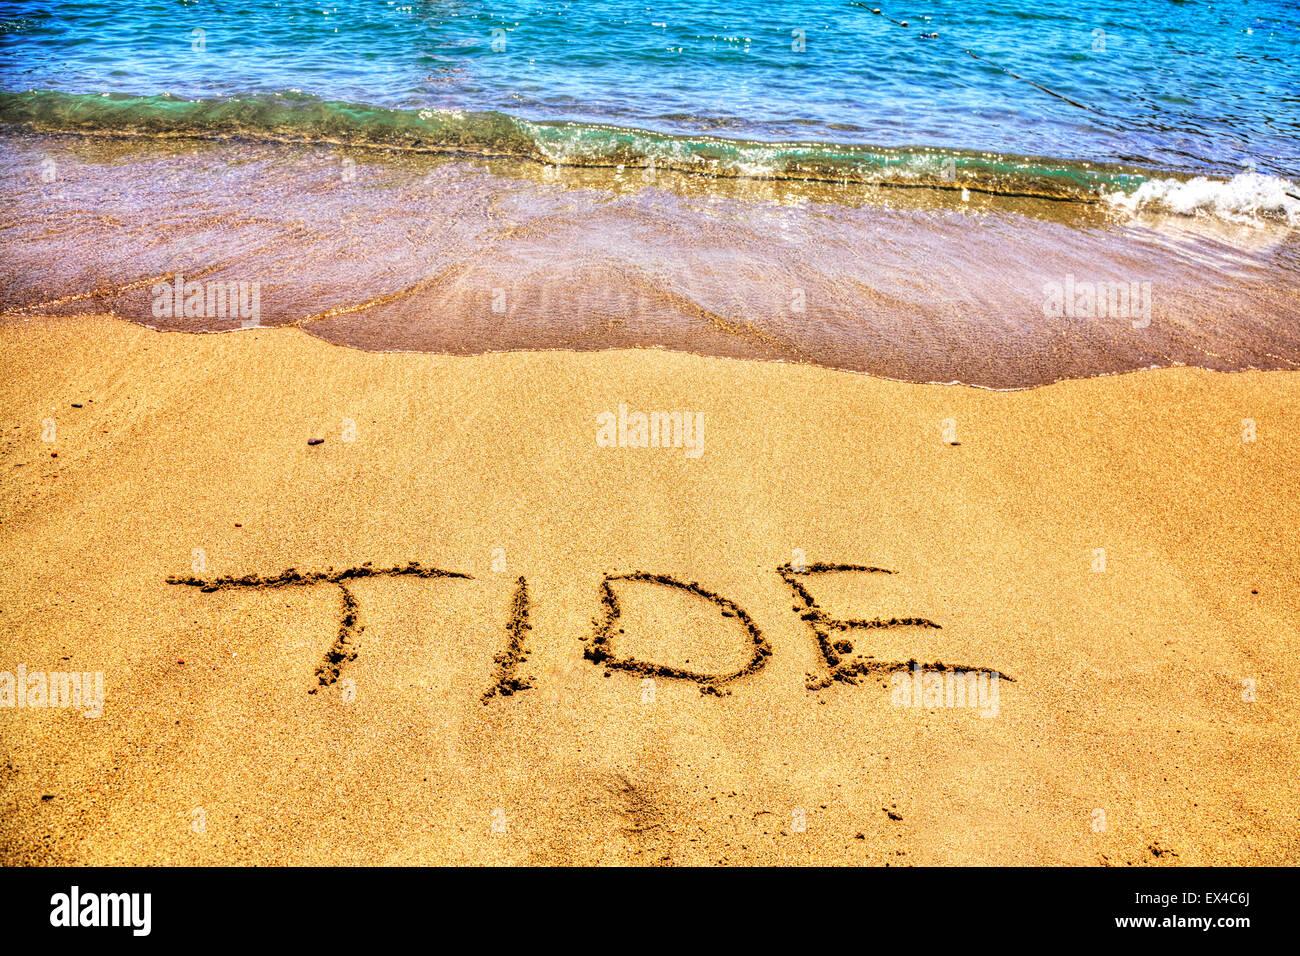 Tide tidal seas oceans word in sand sea ocean line mark written on beach resort sea coast coastline holiday getaway - Stock Image